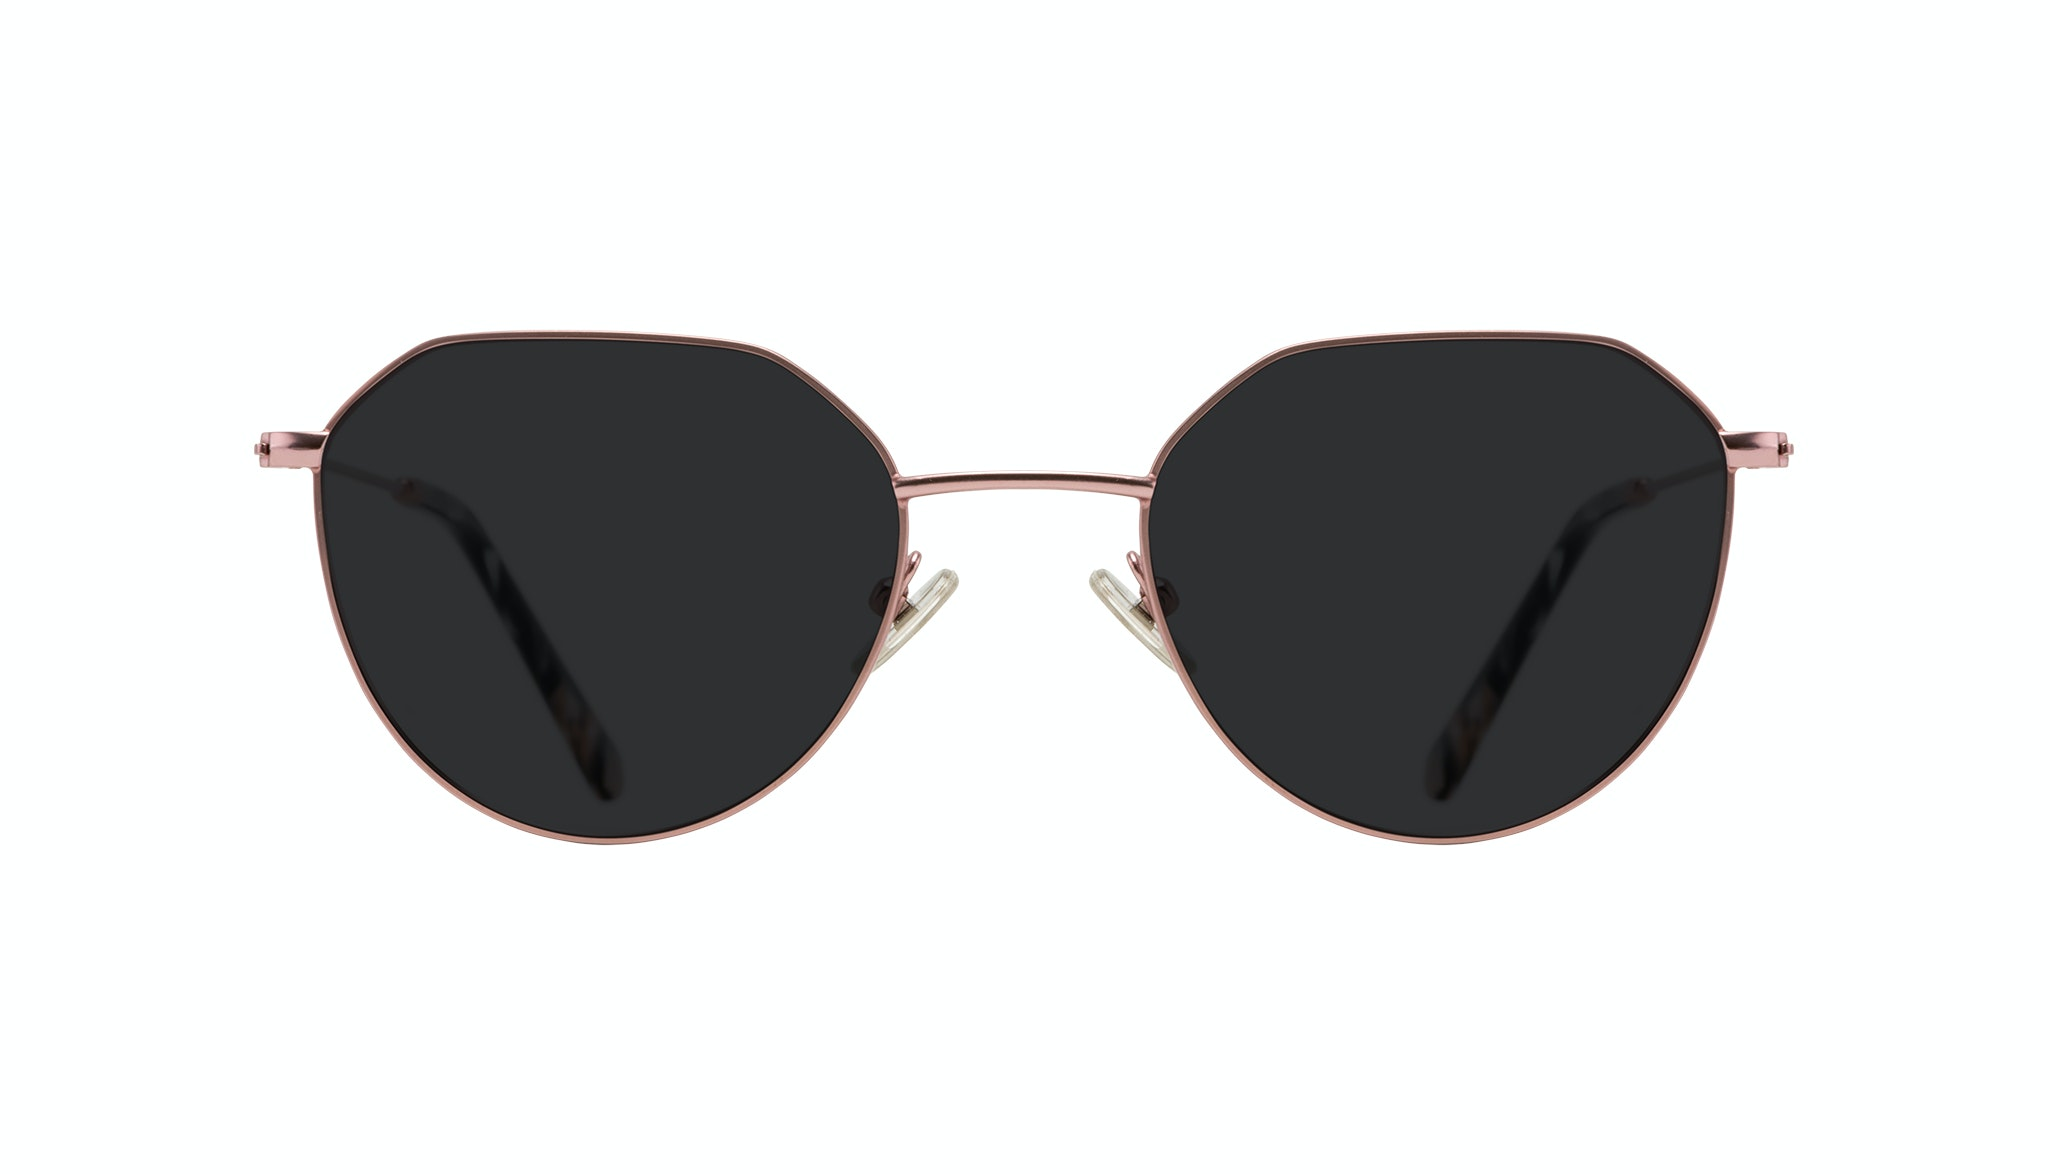 Affordable Fashion Glasses Round Sunglasses Women Prism Blush Front